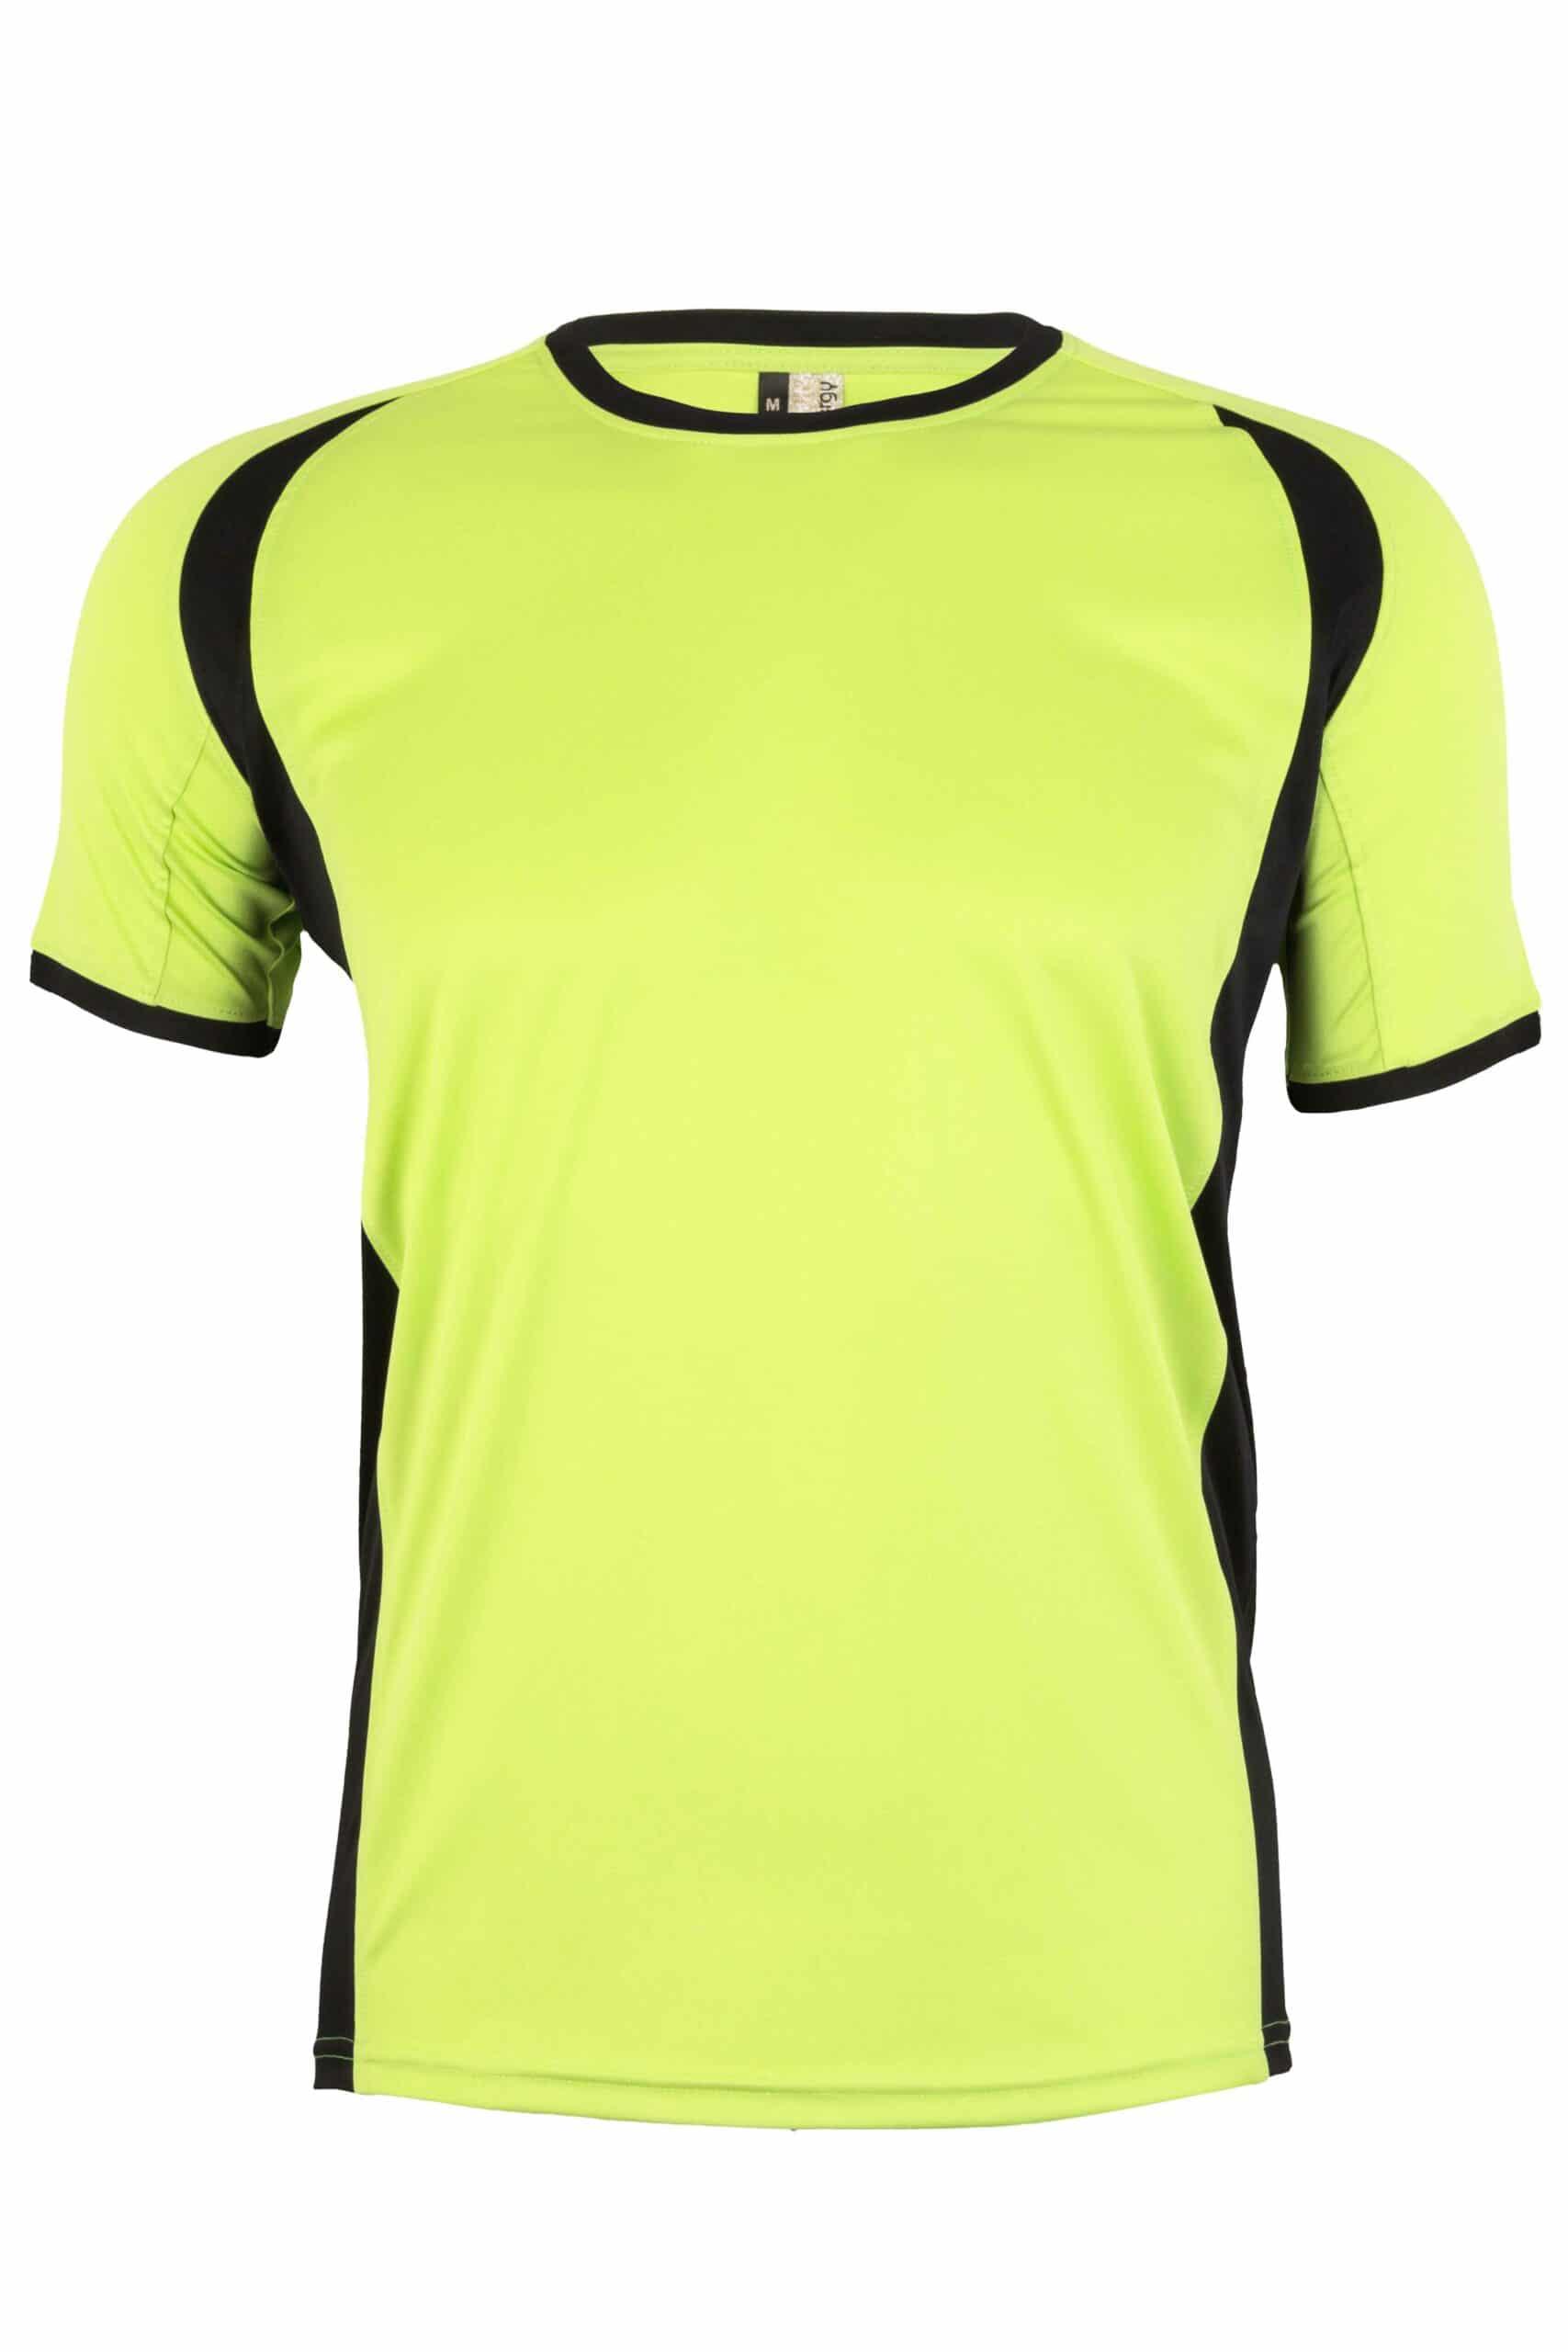 Mukua Mk530v Mukua Camiseta TÉcnica Manga Corta Bicolor Lime Blak 1